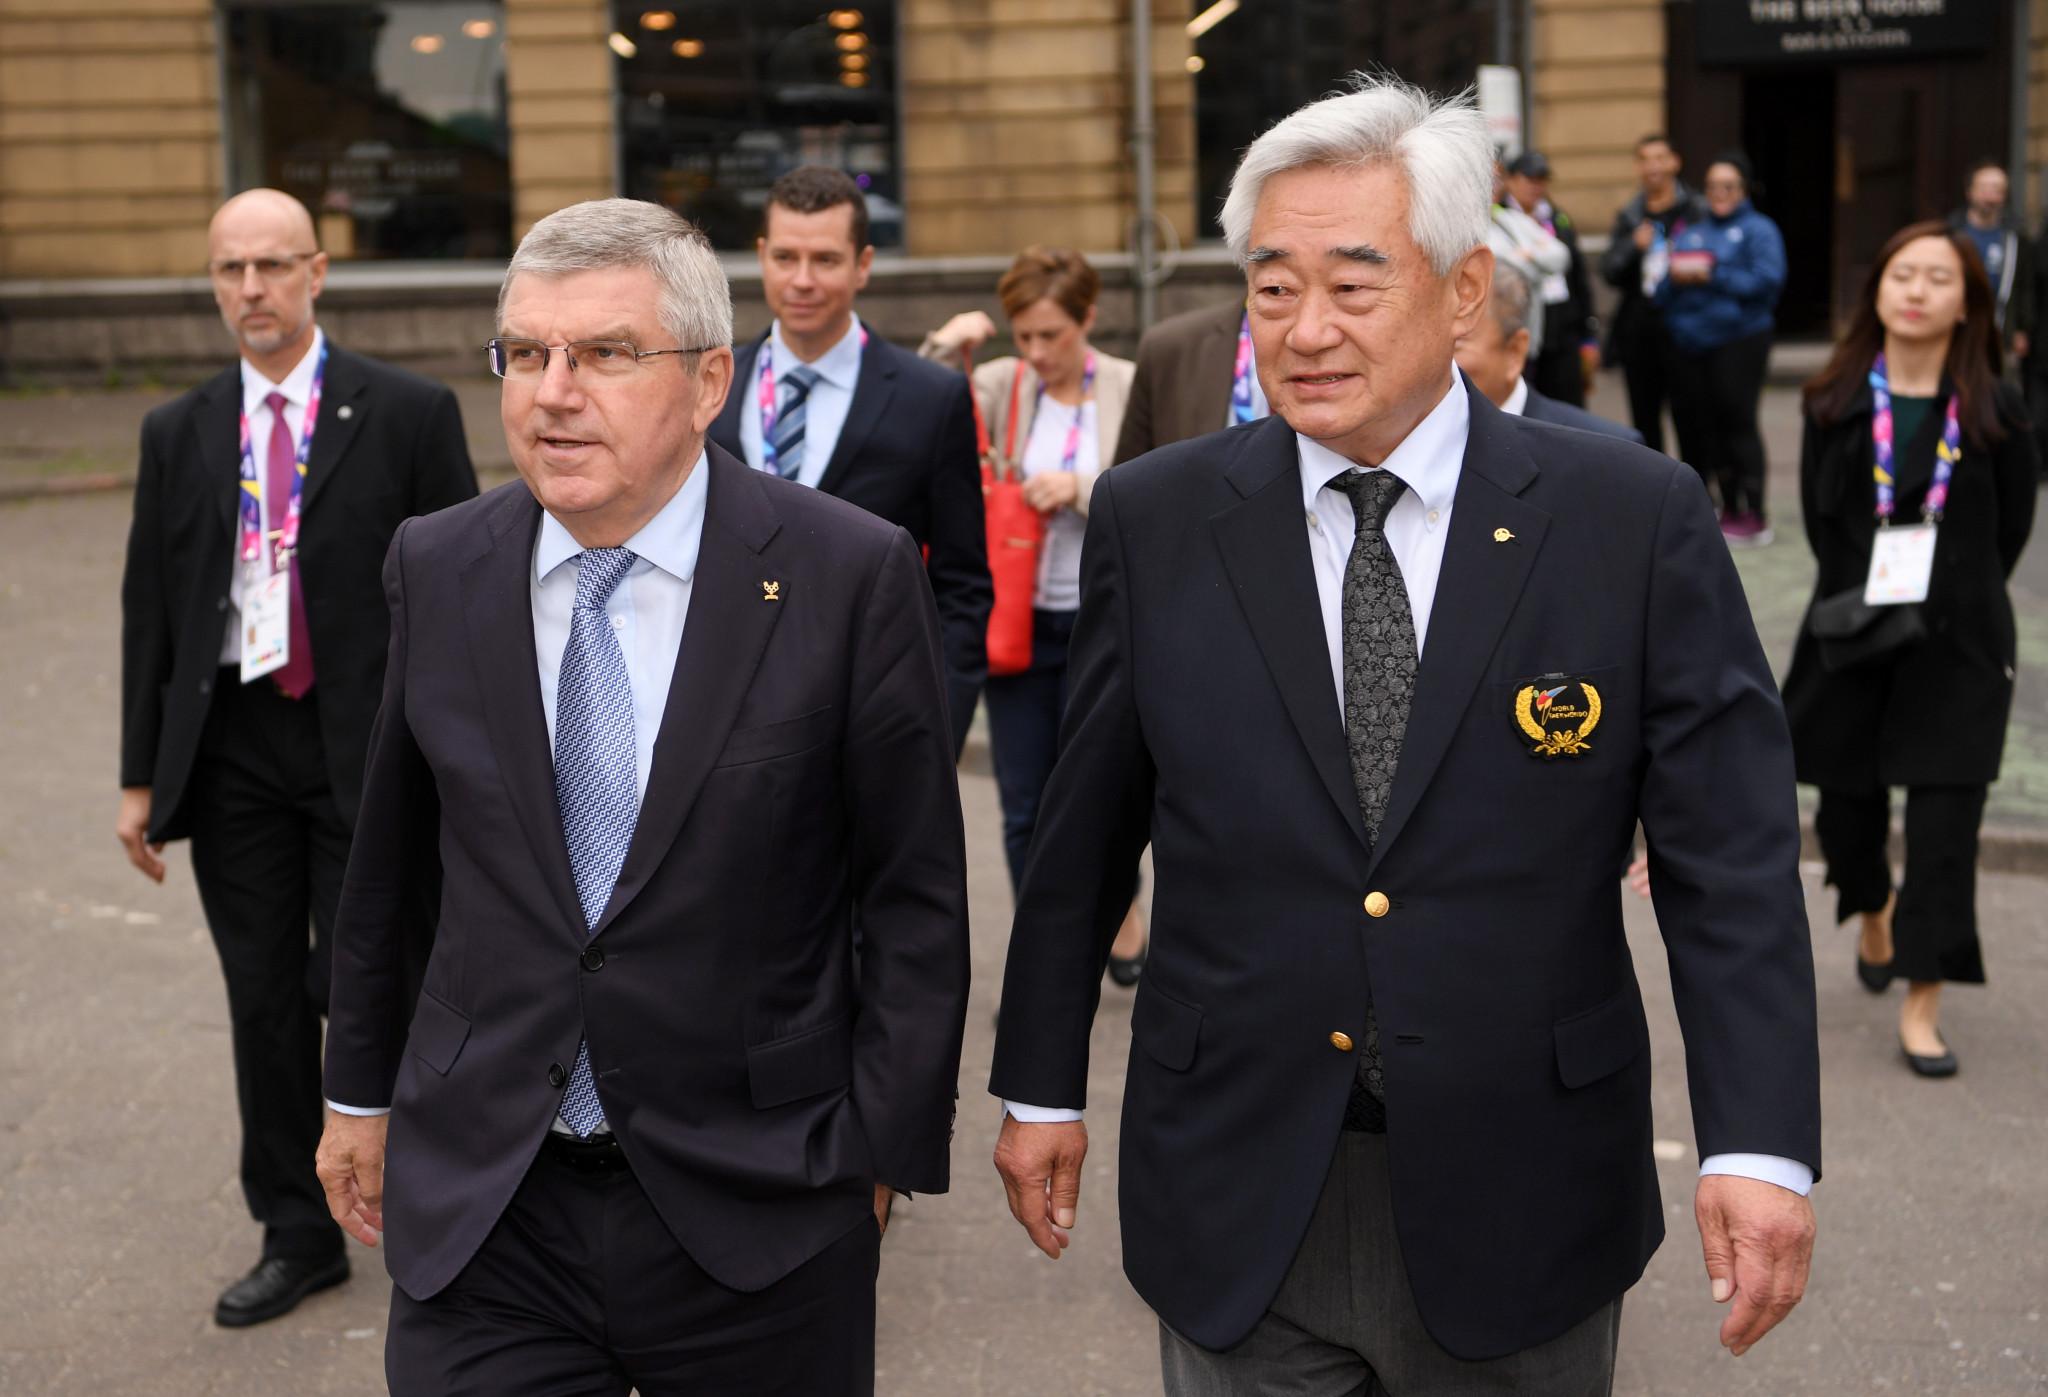 World Taekwondo President Choue among Peace and Sport International Forum speakers